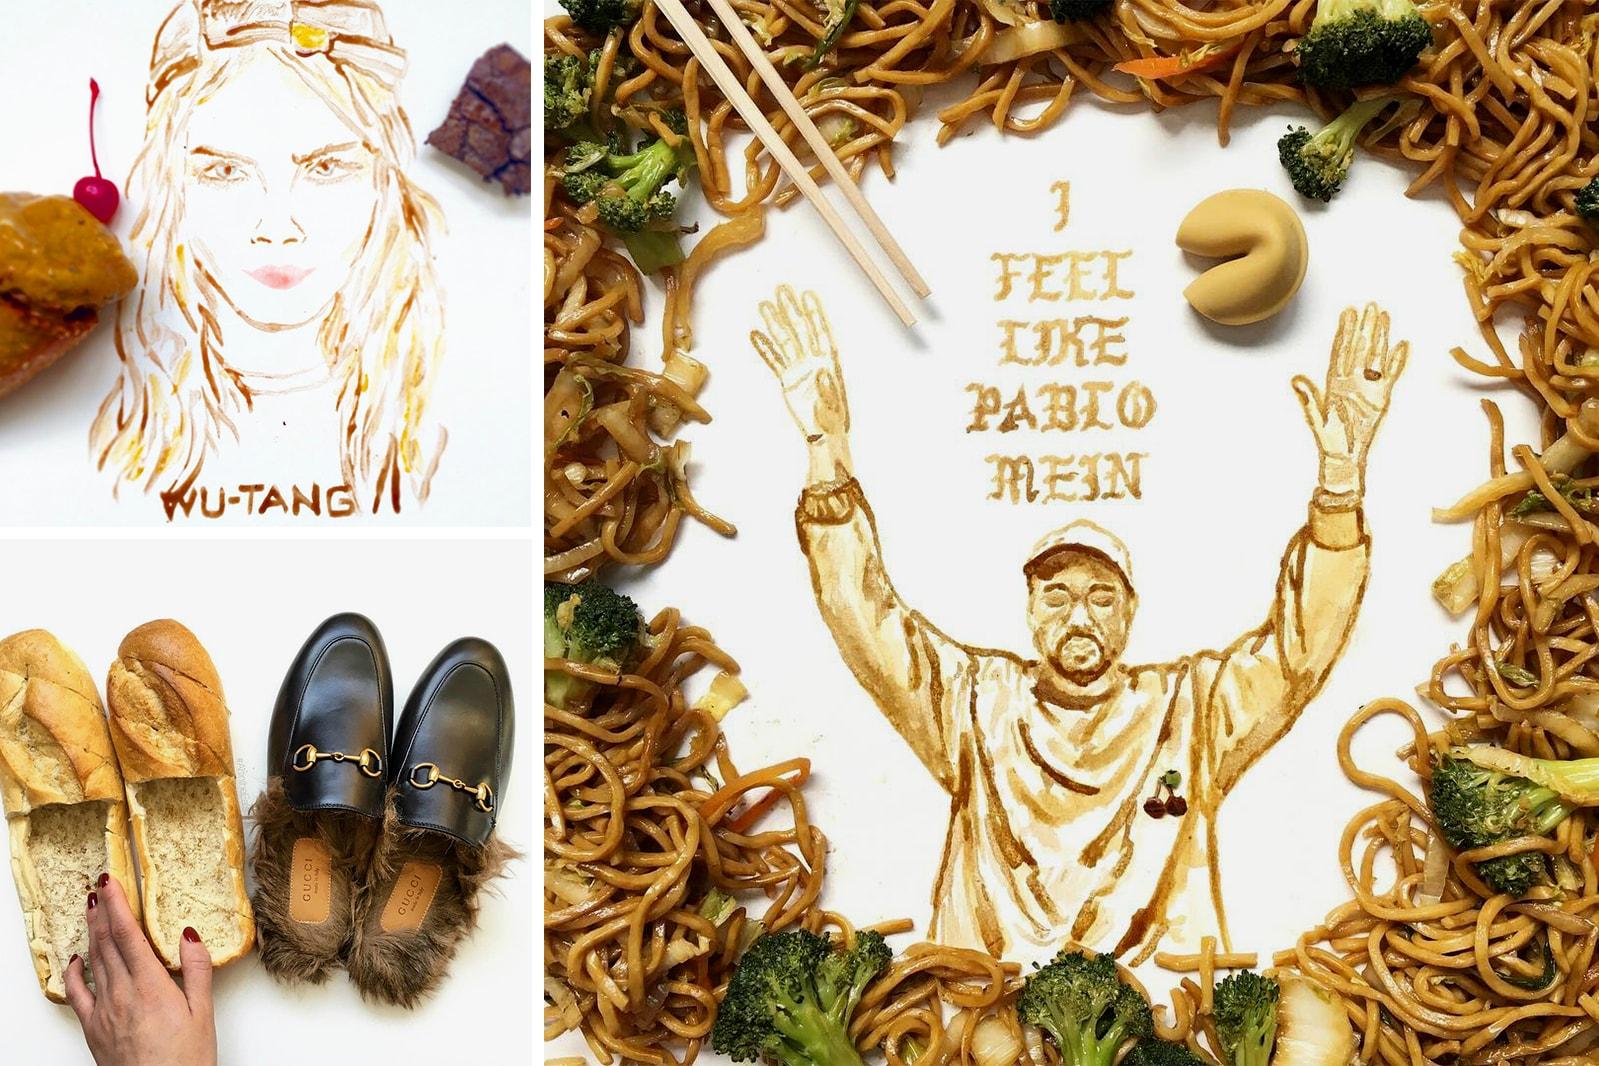 Food Accounts Instagram Kimoji Kim Kardashian Cookie Supreme Latte Drake on Cake Tisha Cherry